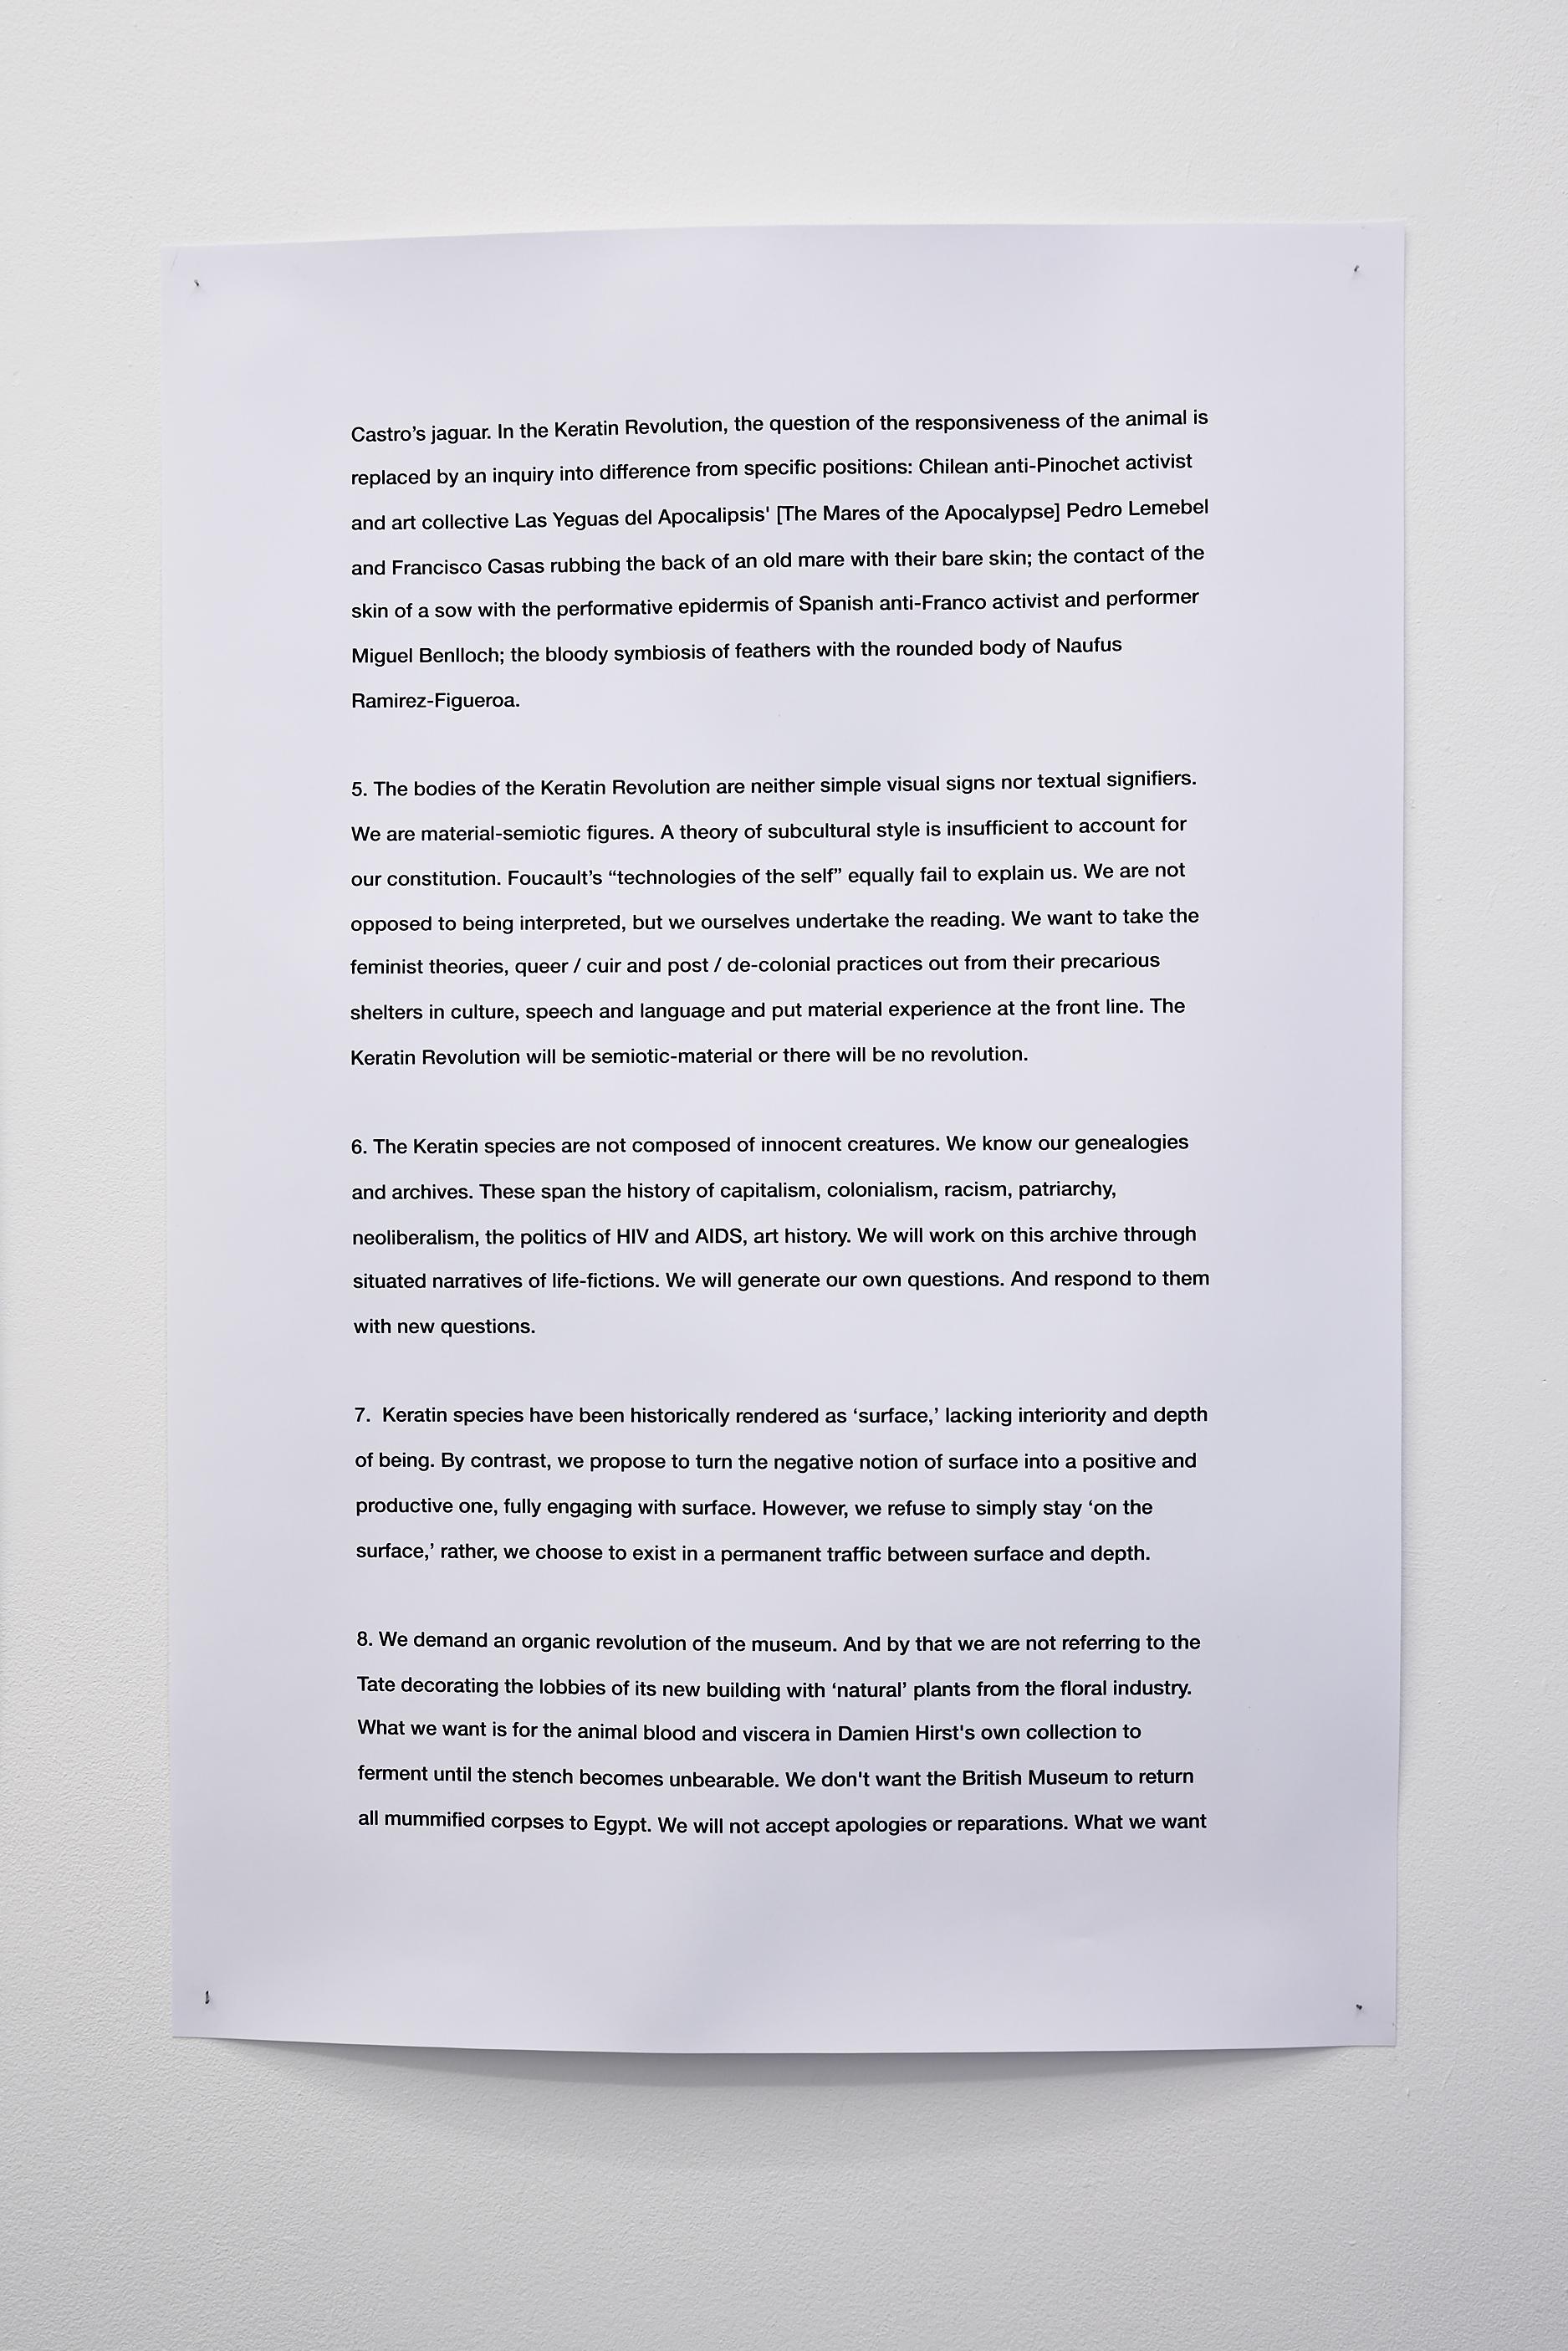 Aimar Arriola, Keratin Manifesto, 2017.